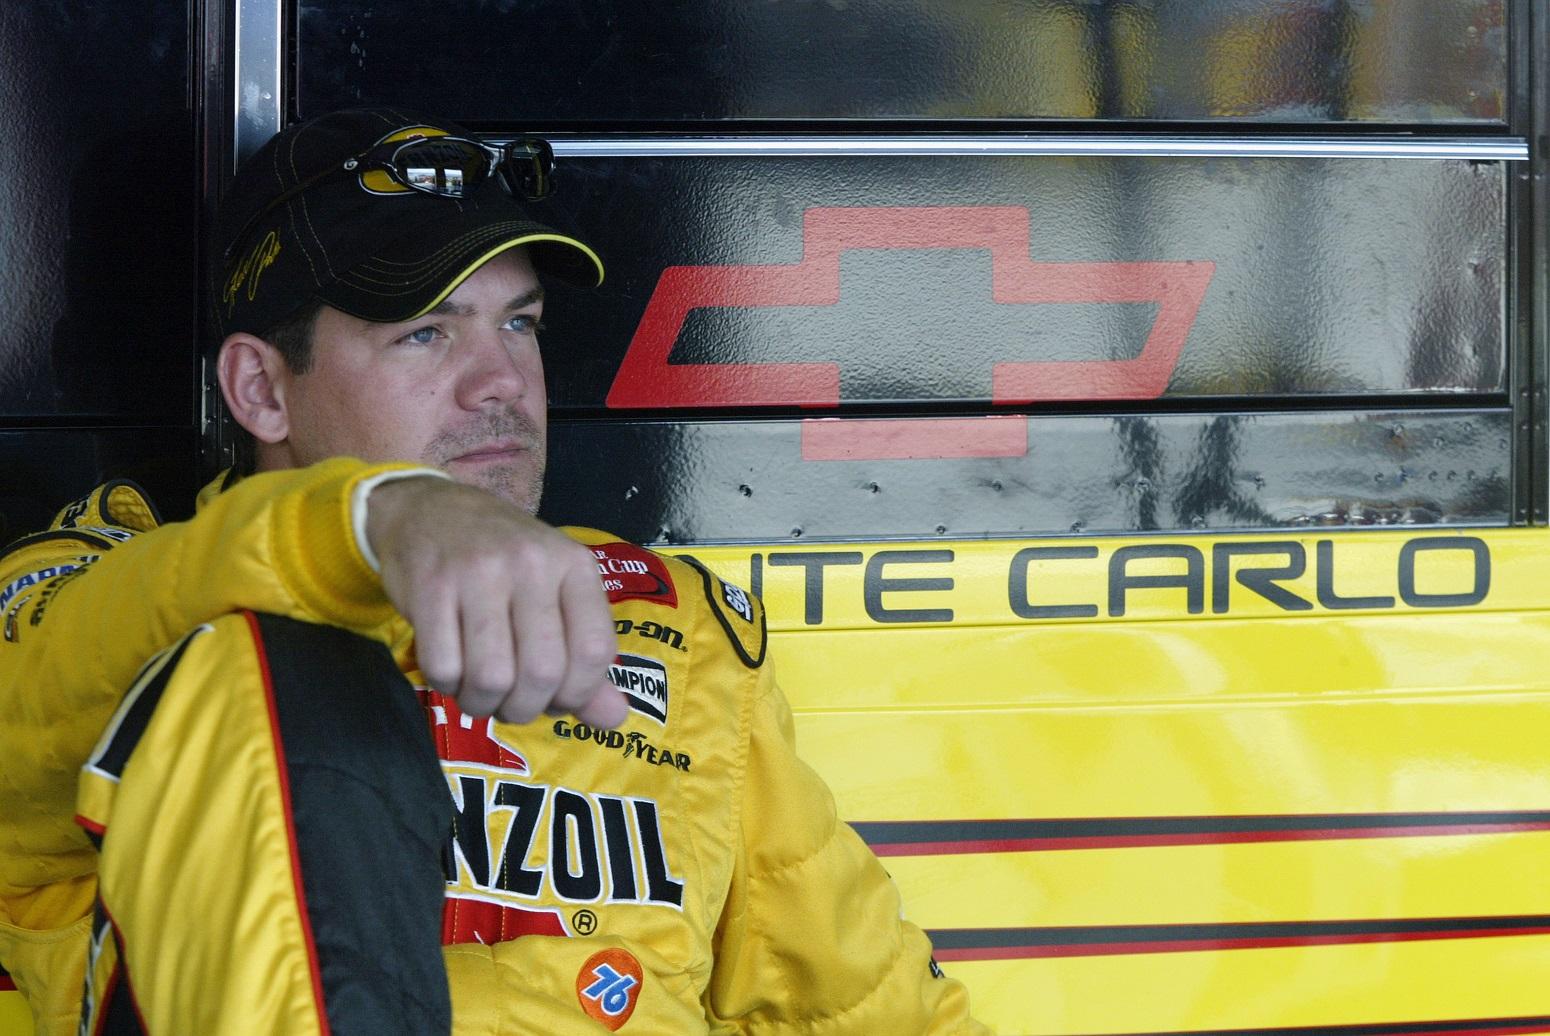 Steve Park NASCAR career derailed freak accident